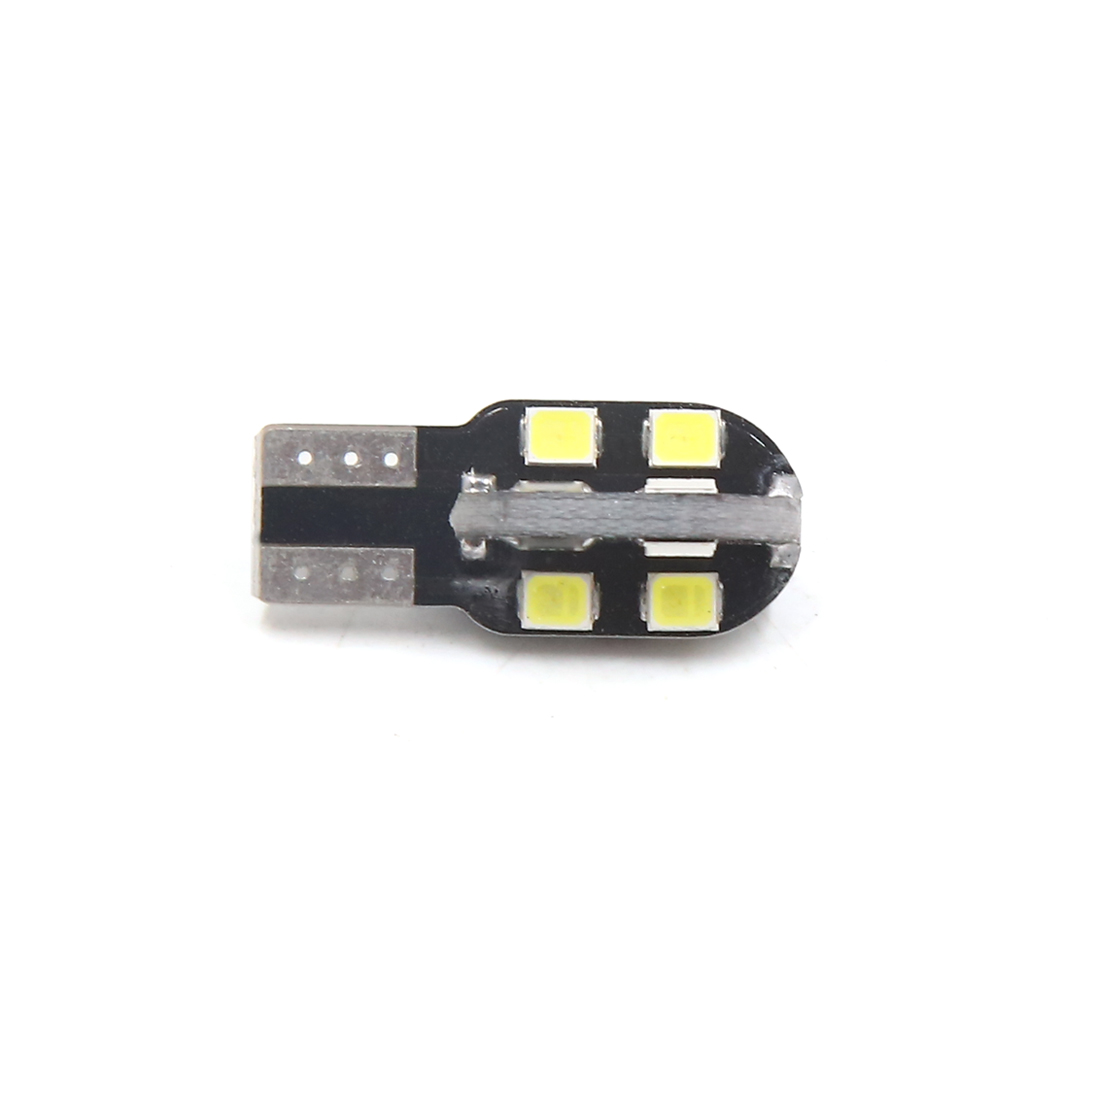 15PCS 12V White T10 LED Car Dashboard Reading Light Interior for BMW X5 F18 - image 2 of 3